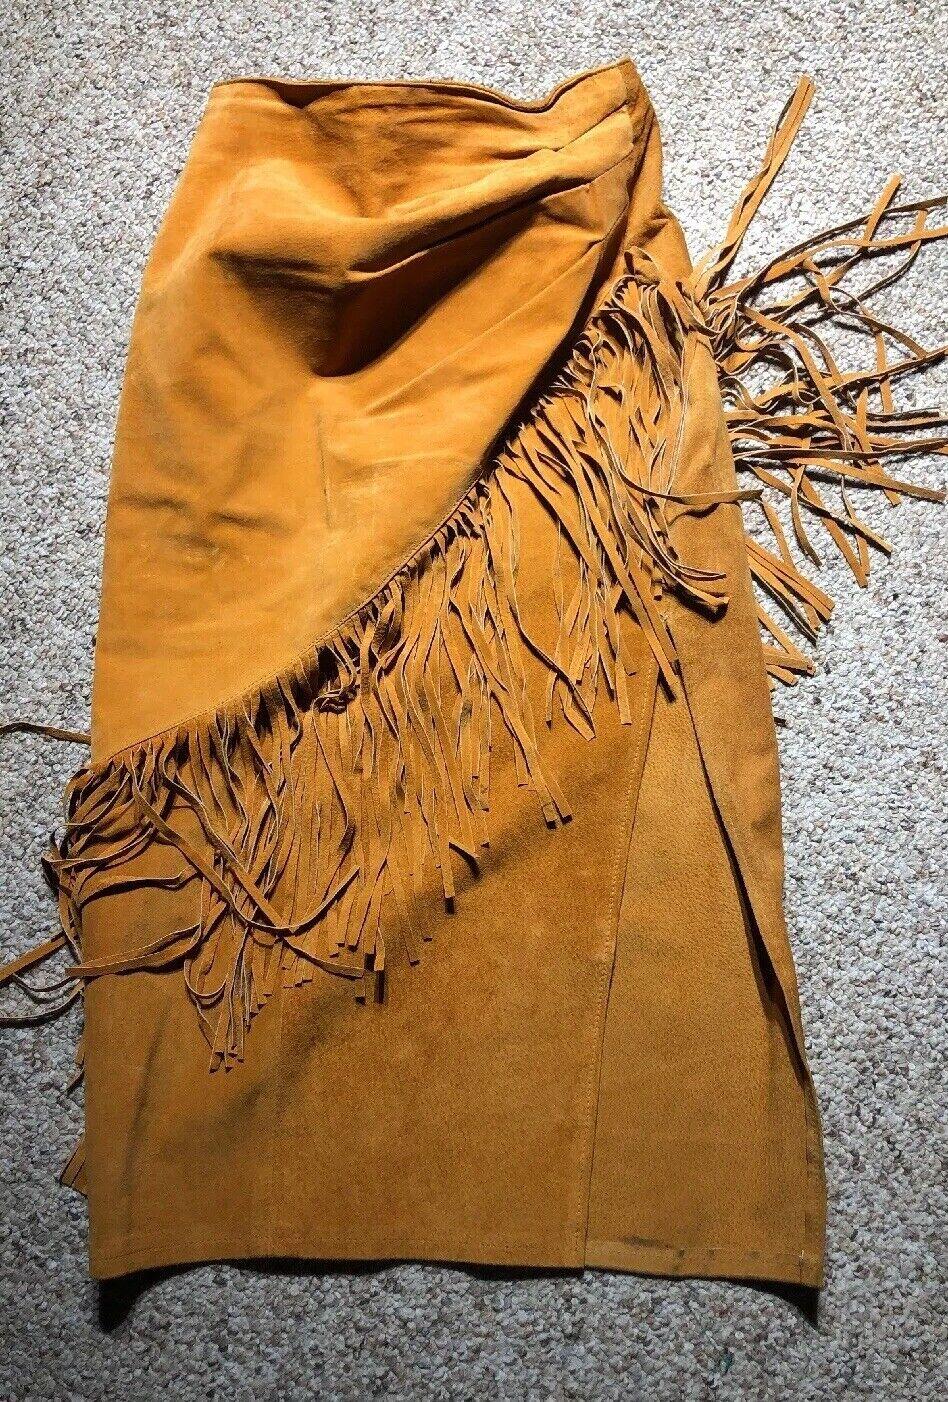 Phoenix Leather USA Fringe Pocahontas Pig Split High Waist Sz 7 8 BOHO HIPPIE